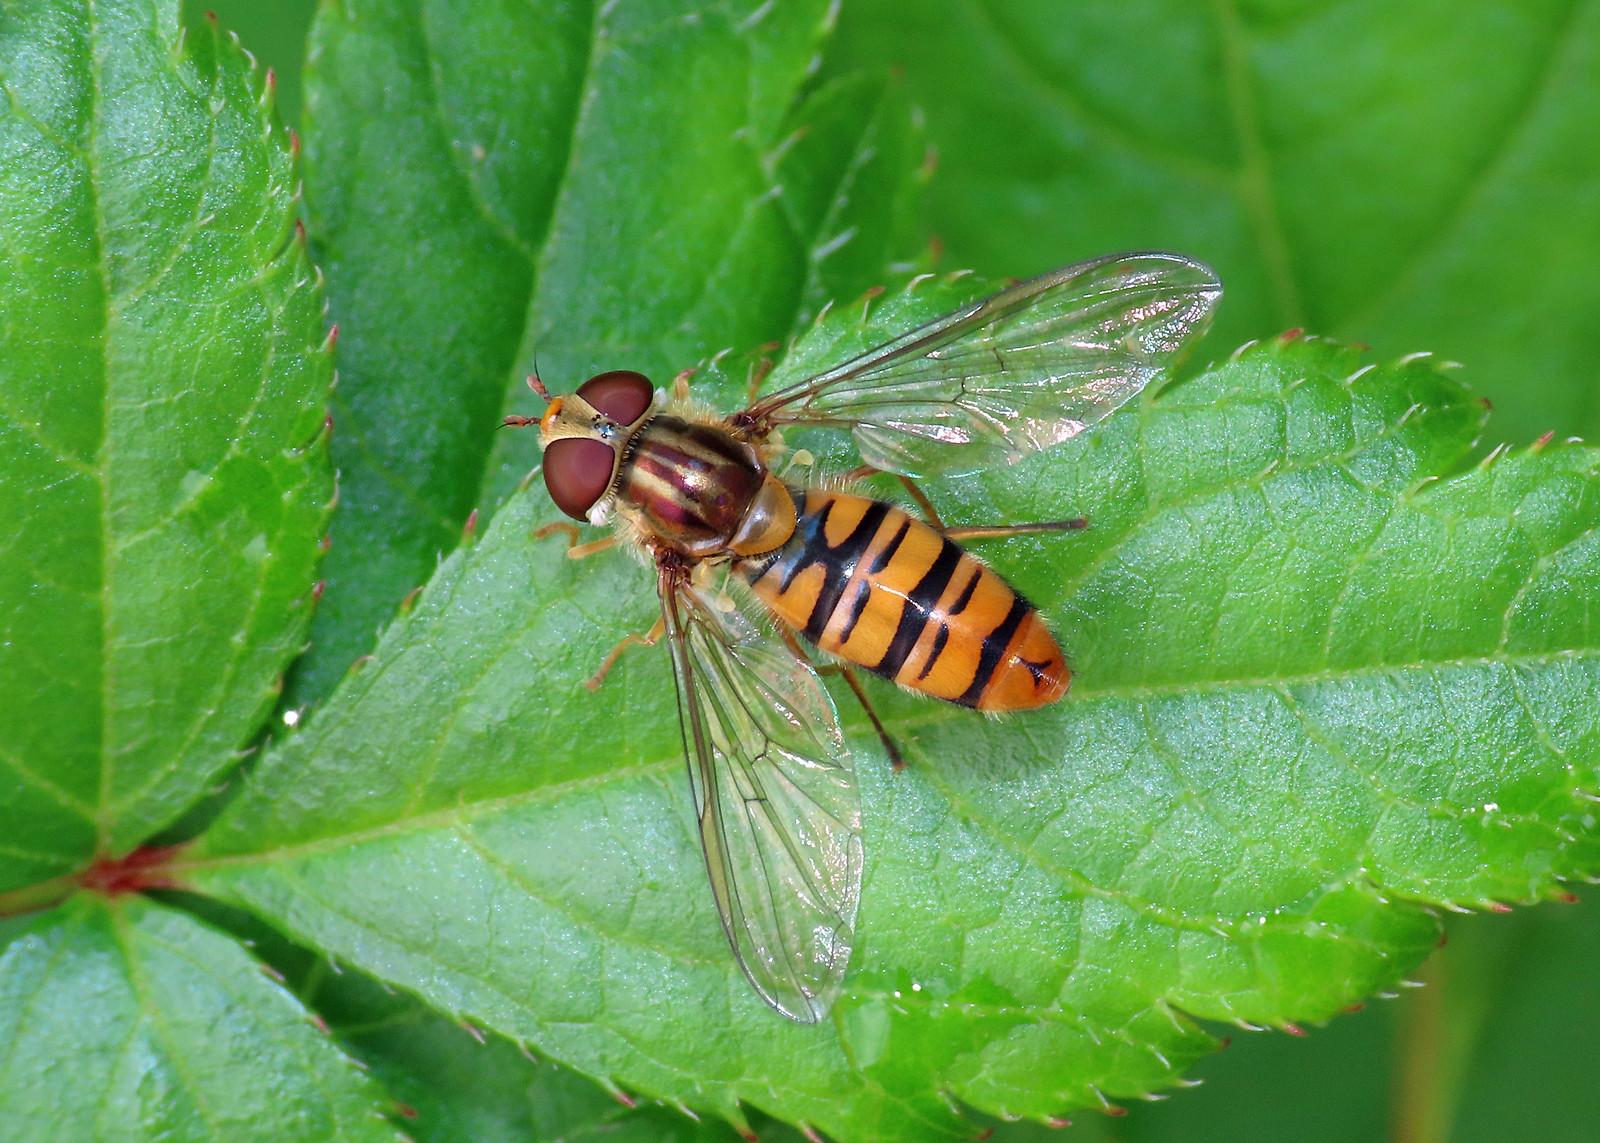 Episyrphus balteatus - Marmalade Hoverfly